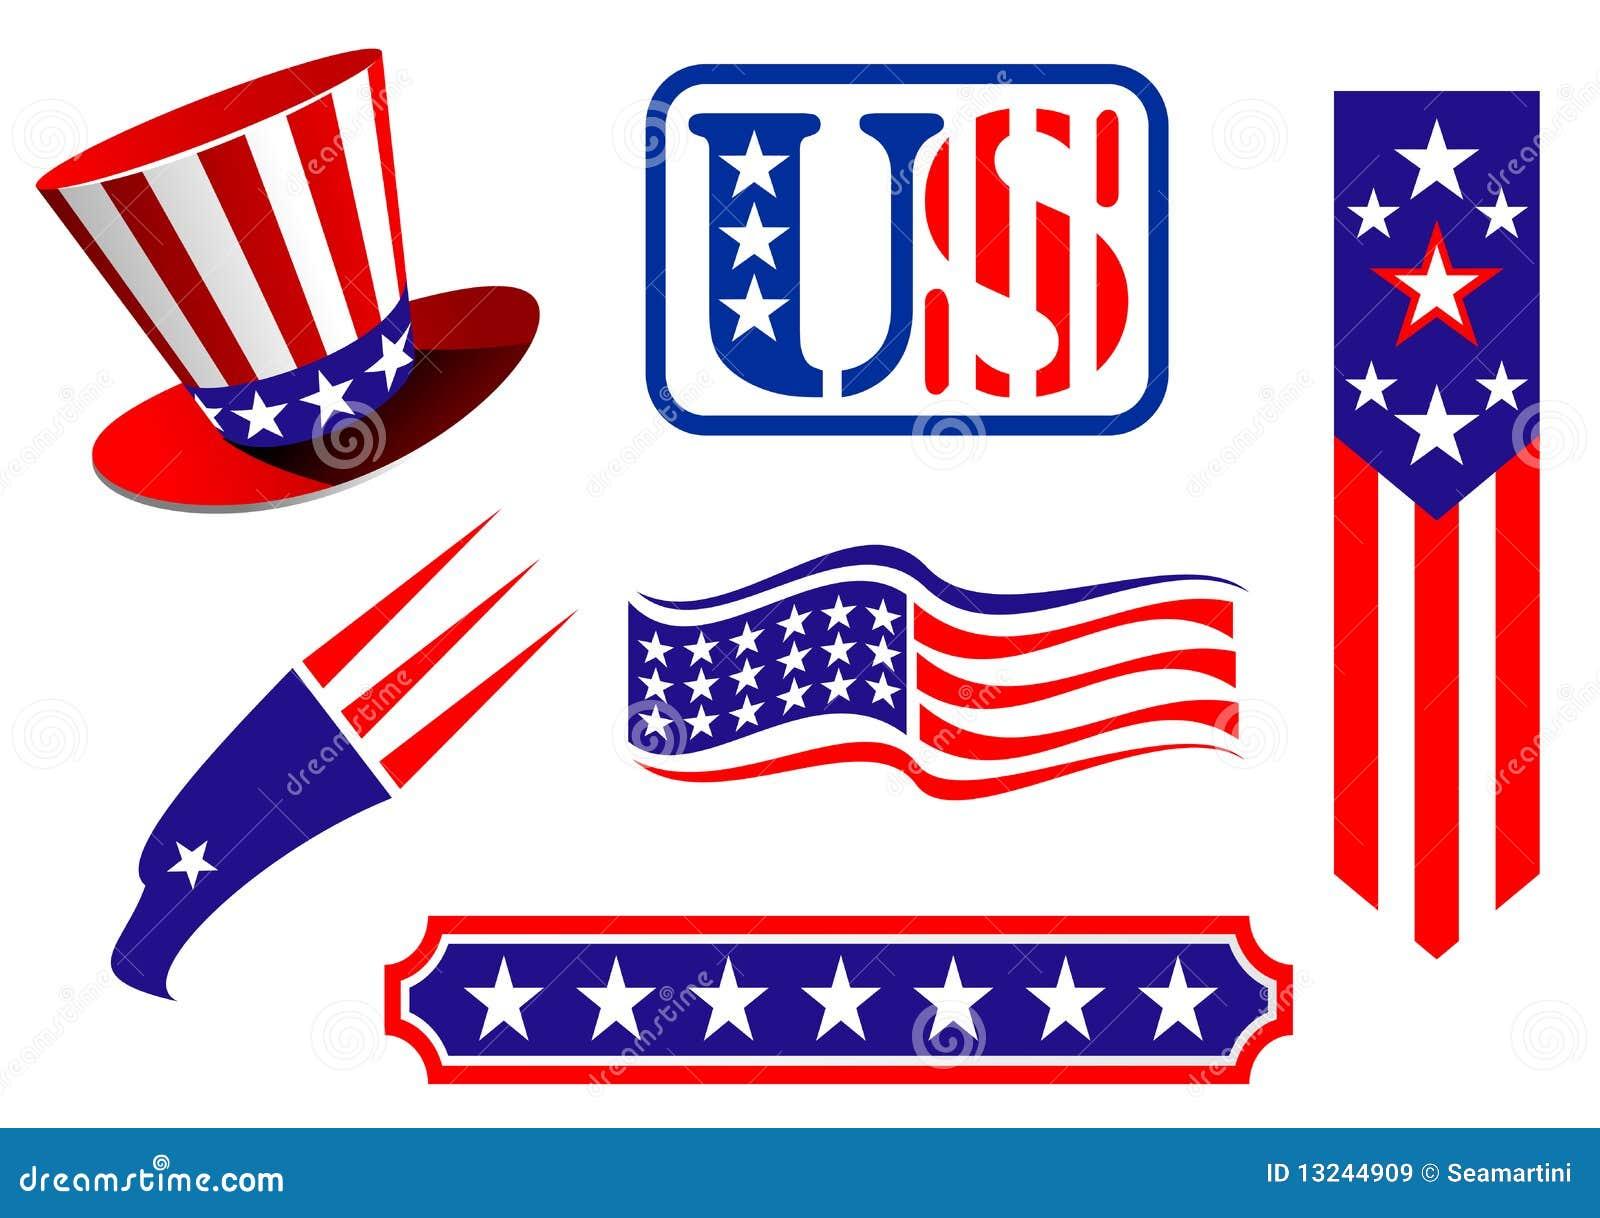 american patriotic symbols stock vector image of design